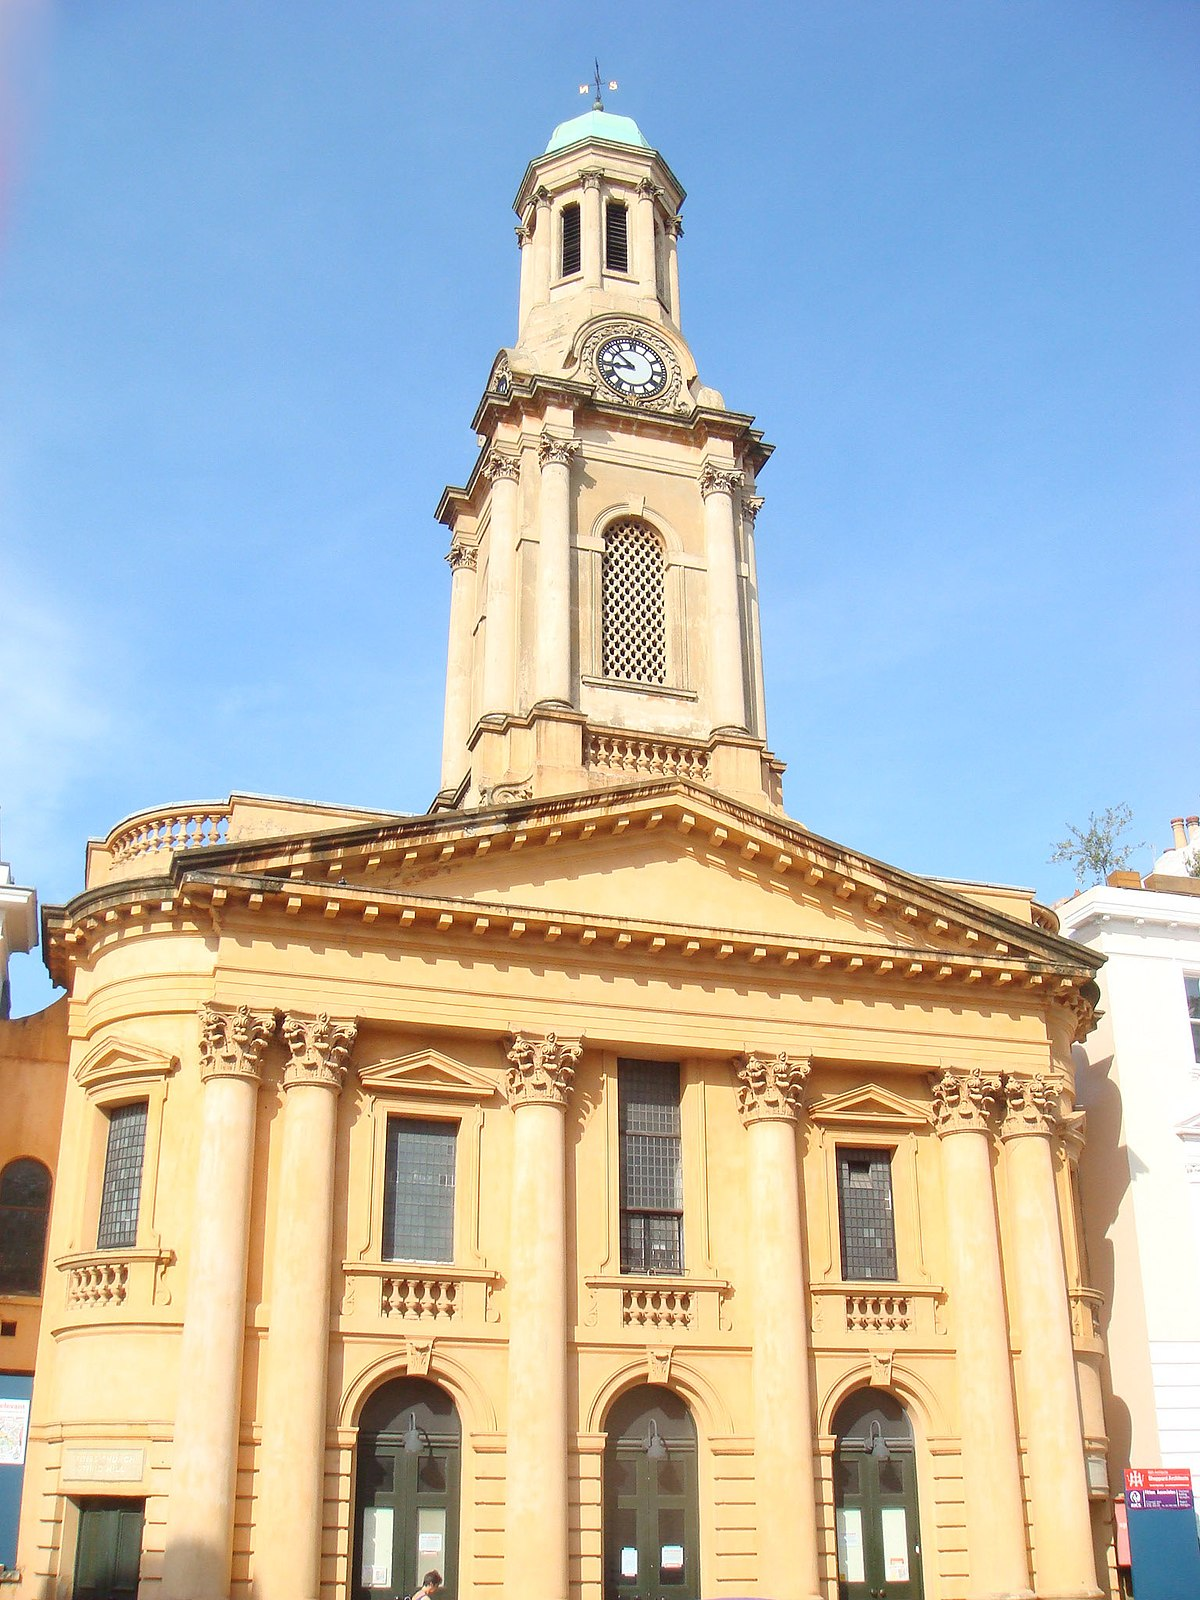 Notting Hill London: St Peter's, Notting Hill